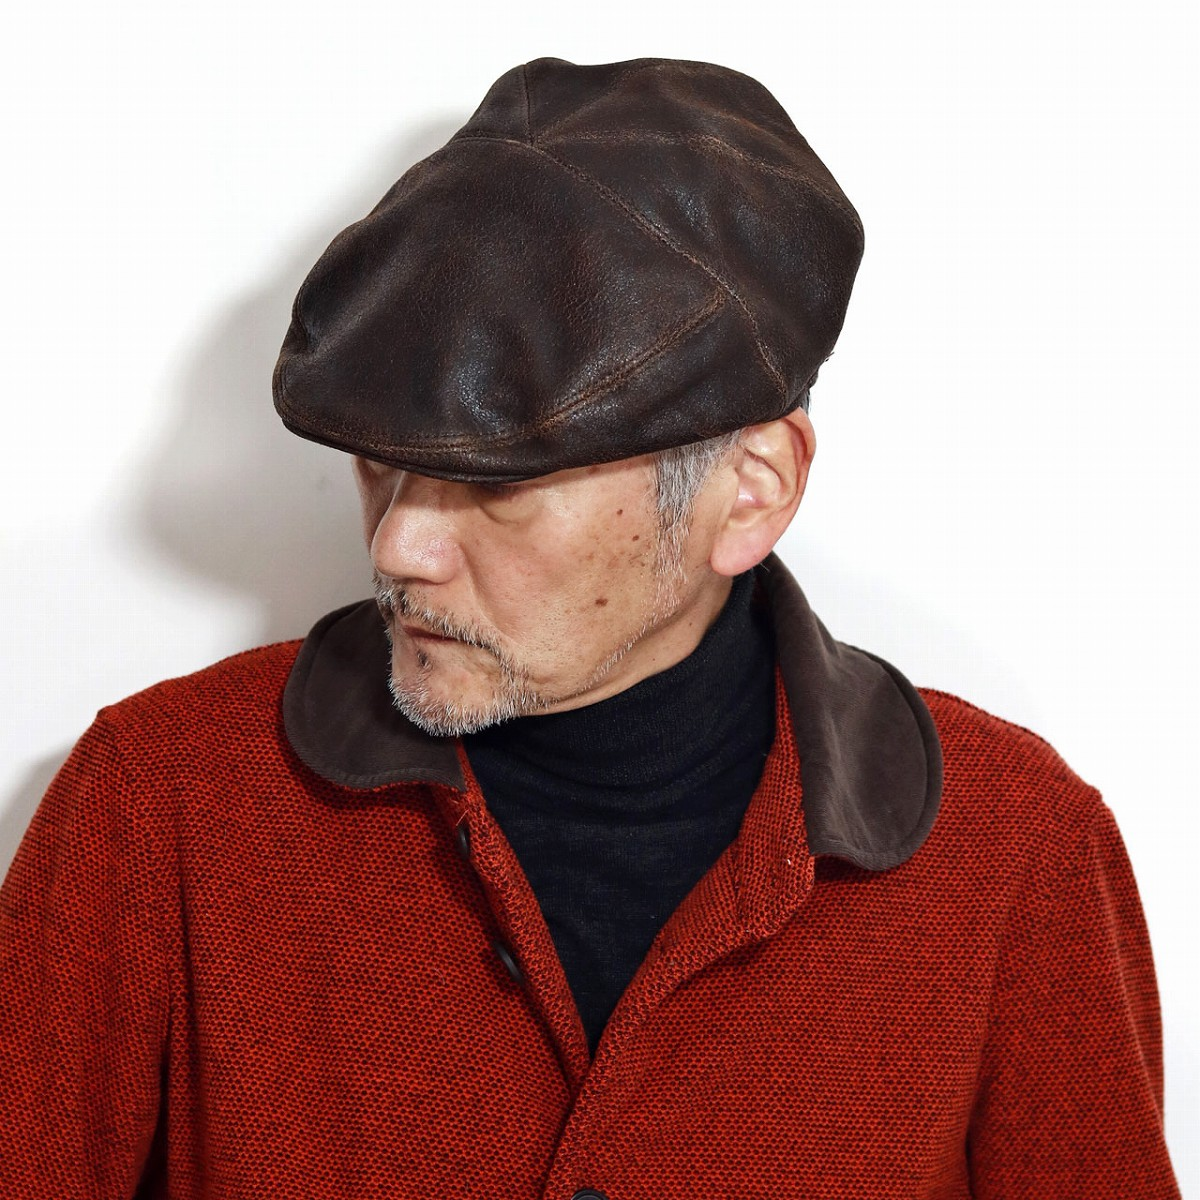 Bailey 帽子 ハンチング 秋 冬 大きいサイズ 高品質 ディストレストレザー ベイリー レザーハンチング ヴィンテージ加工 レディース レトロ インポート 海外 ブランド ハンチング帽 紳士 M L XL / 茶 ブラウン[ ivy cap ]